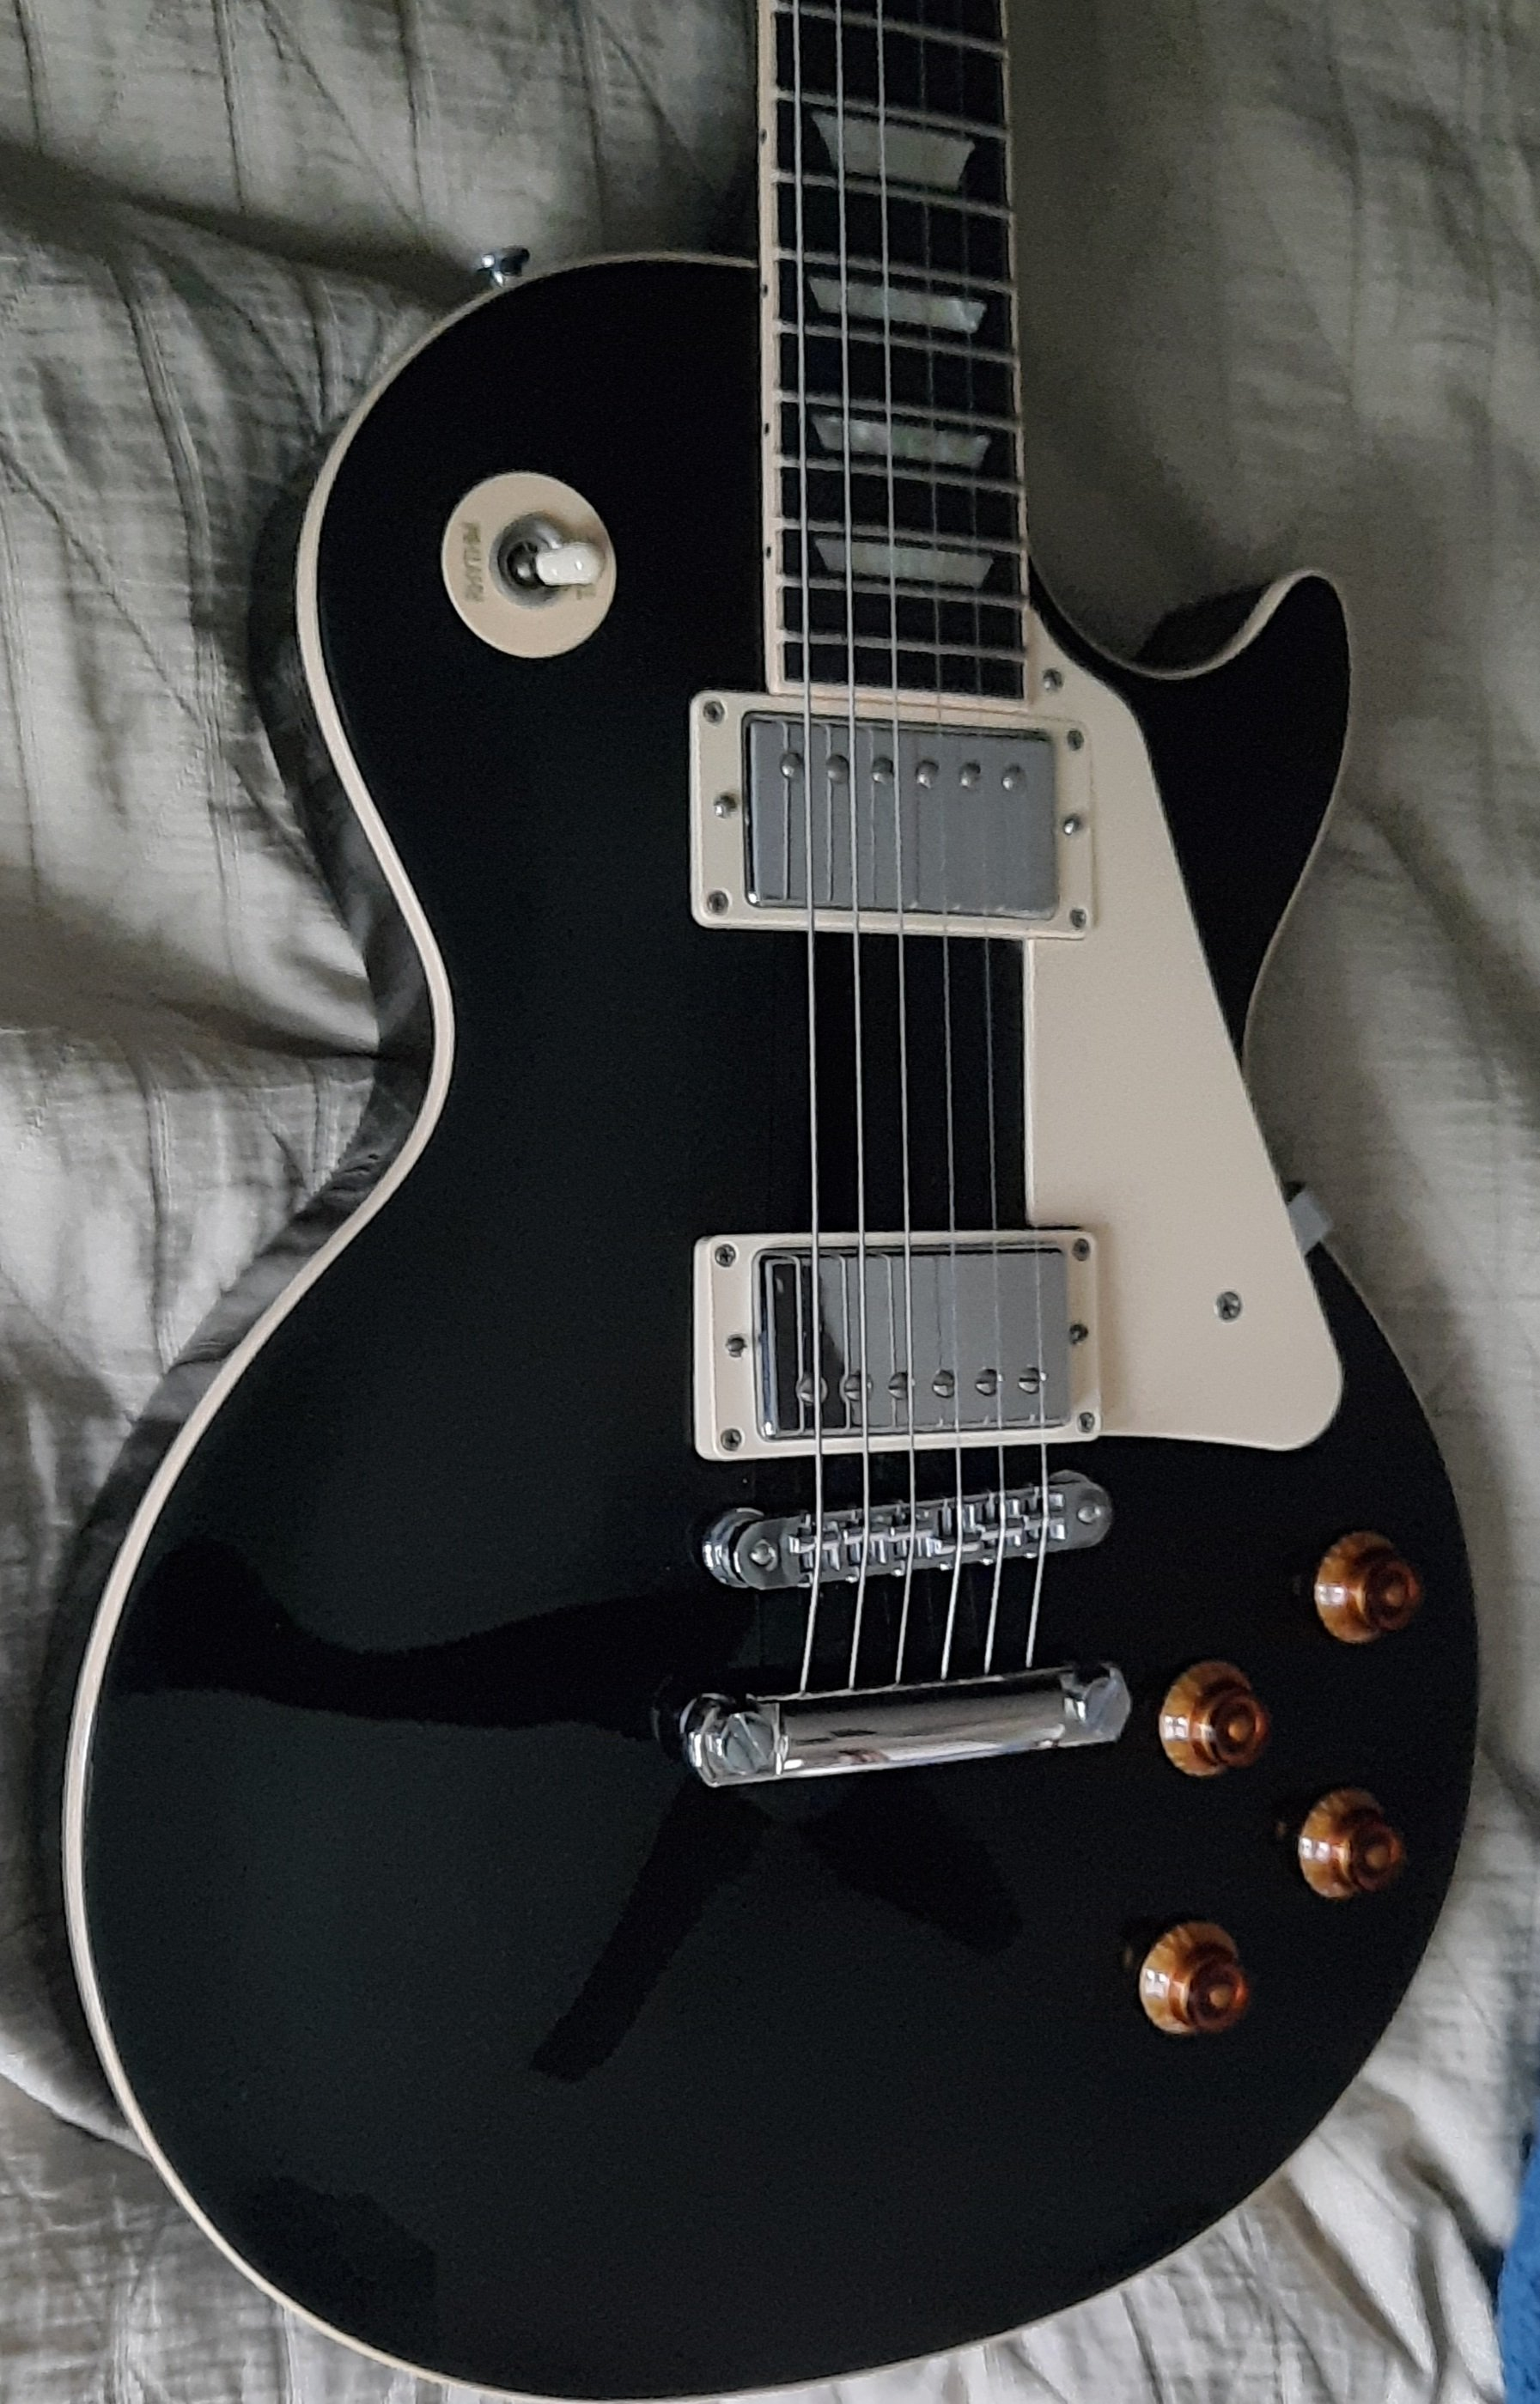 www.guitarscanada.com